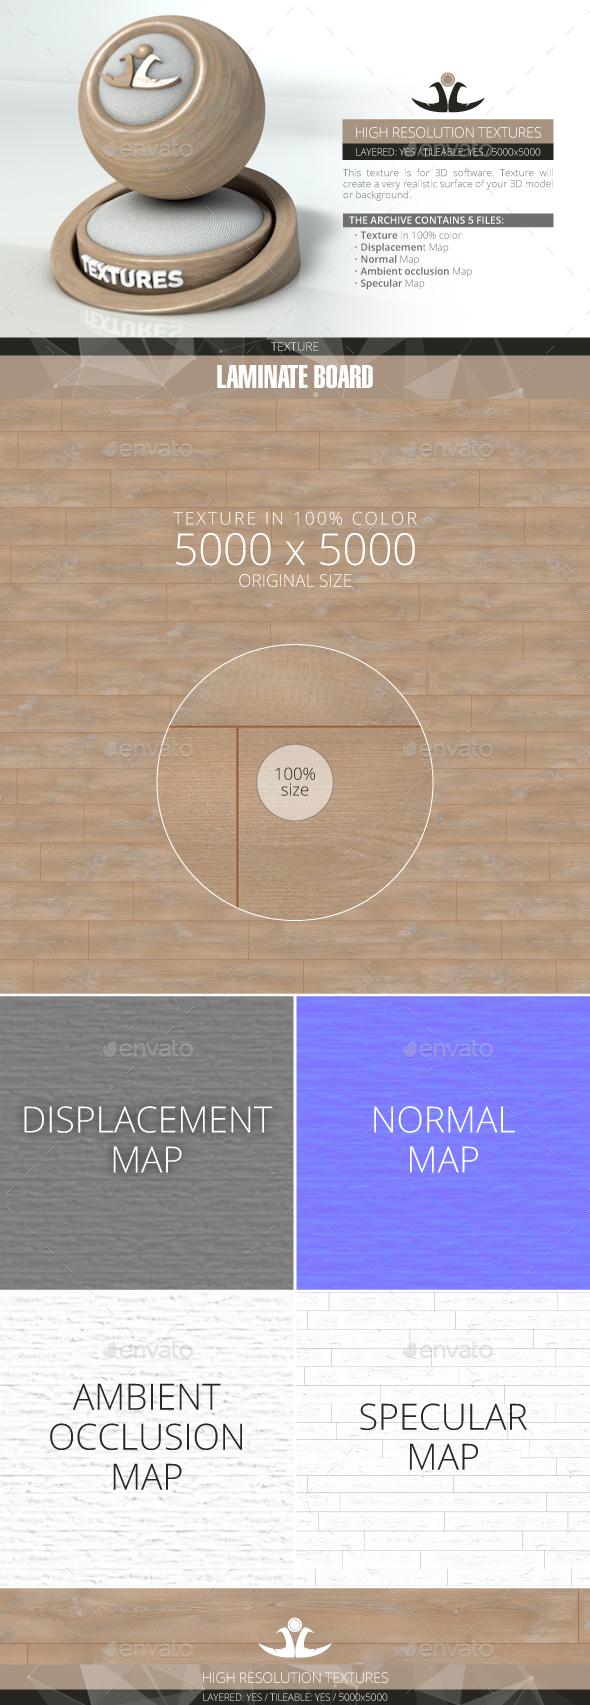 Laminate Board 57 - 3DOcean Item for Sale